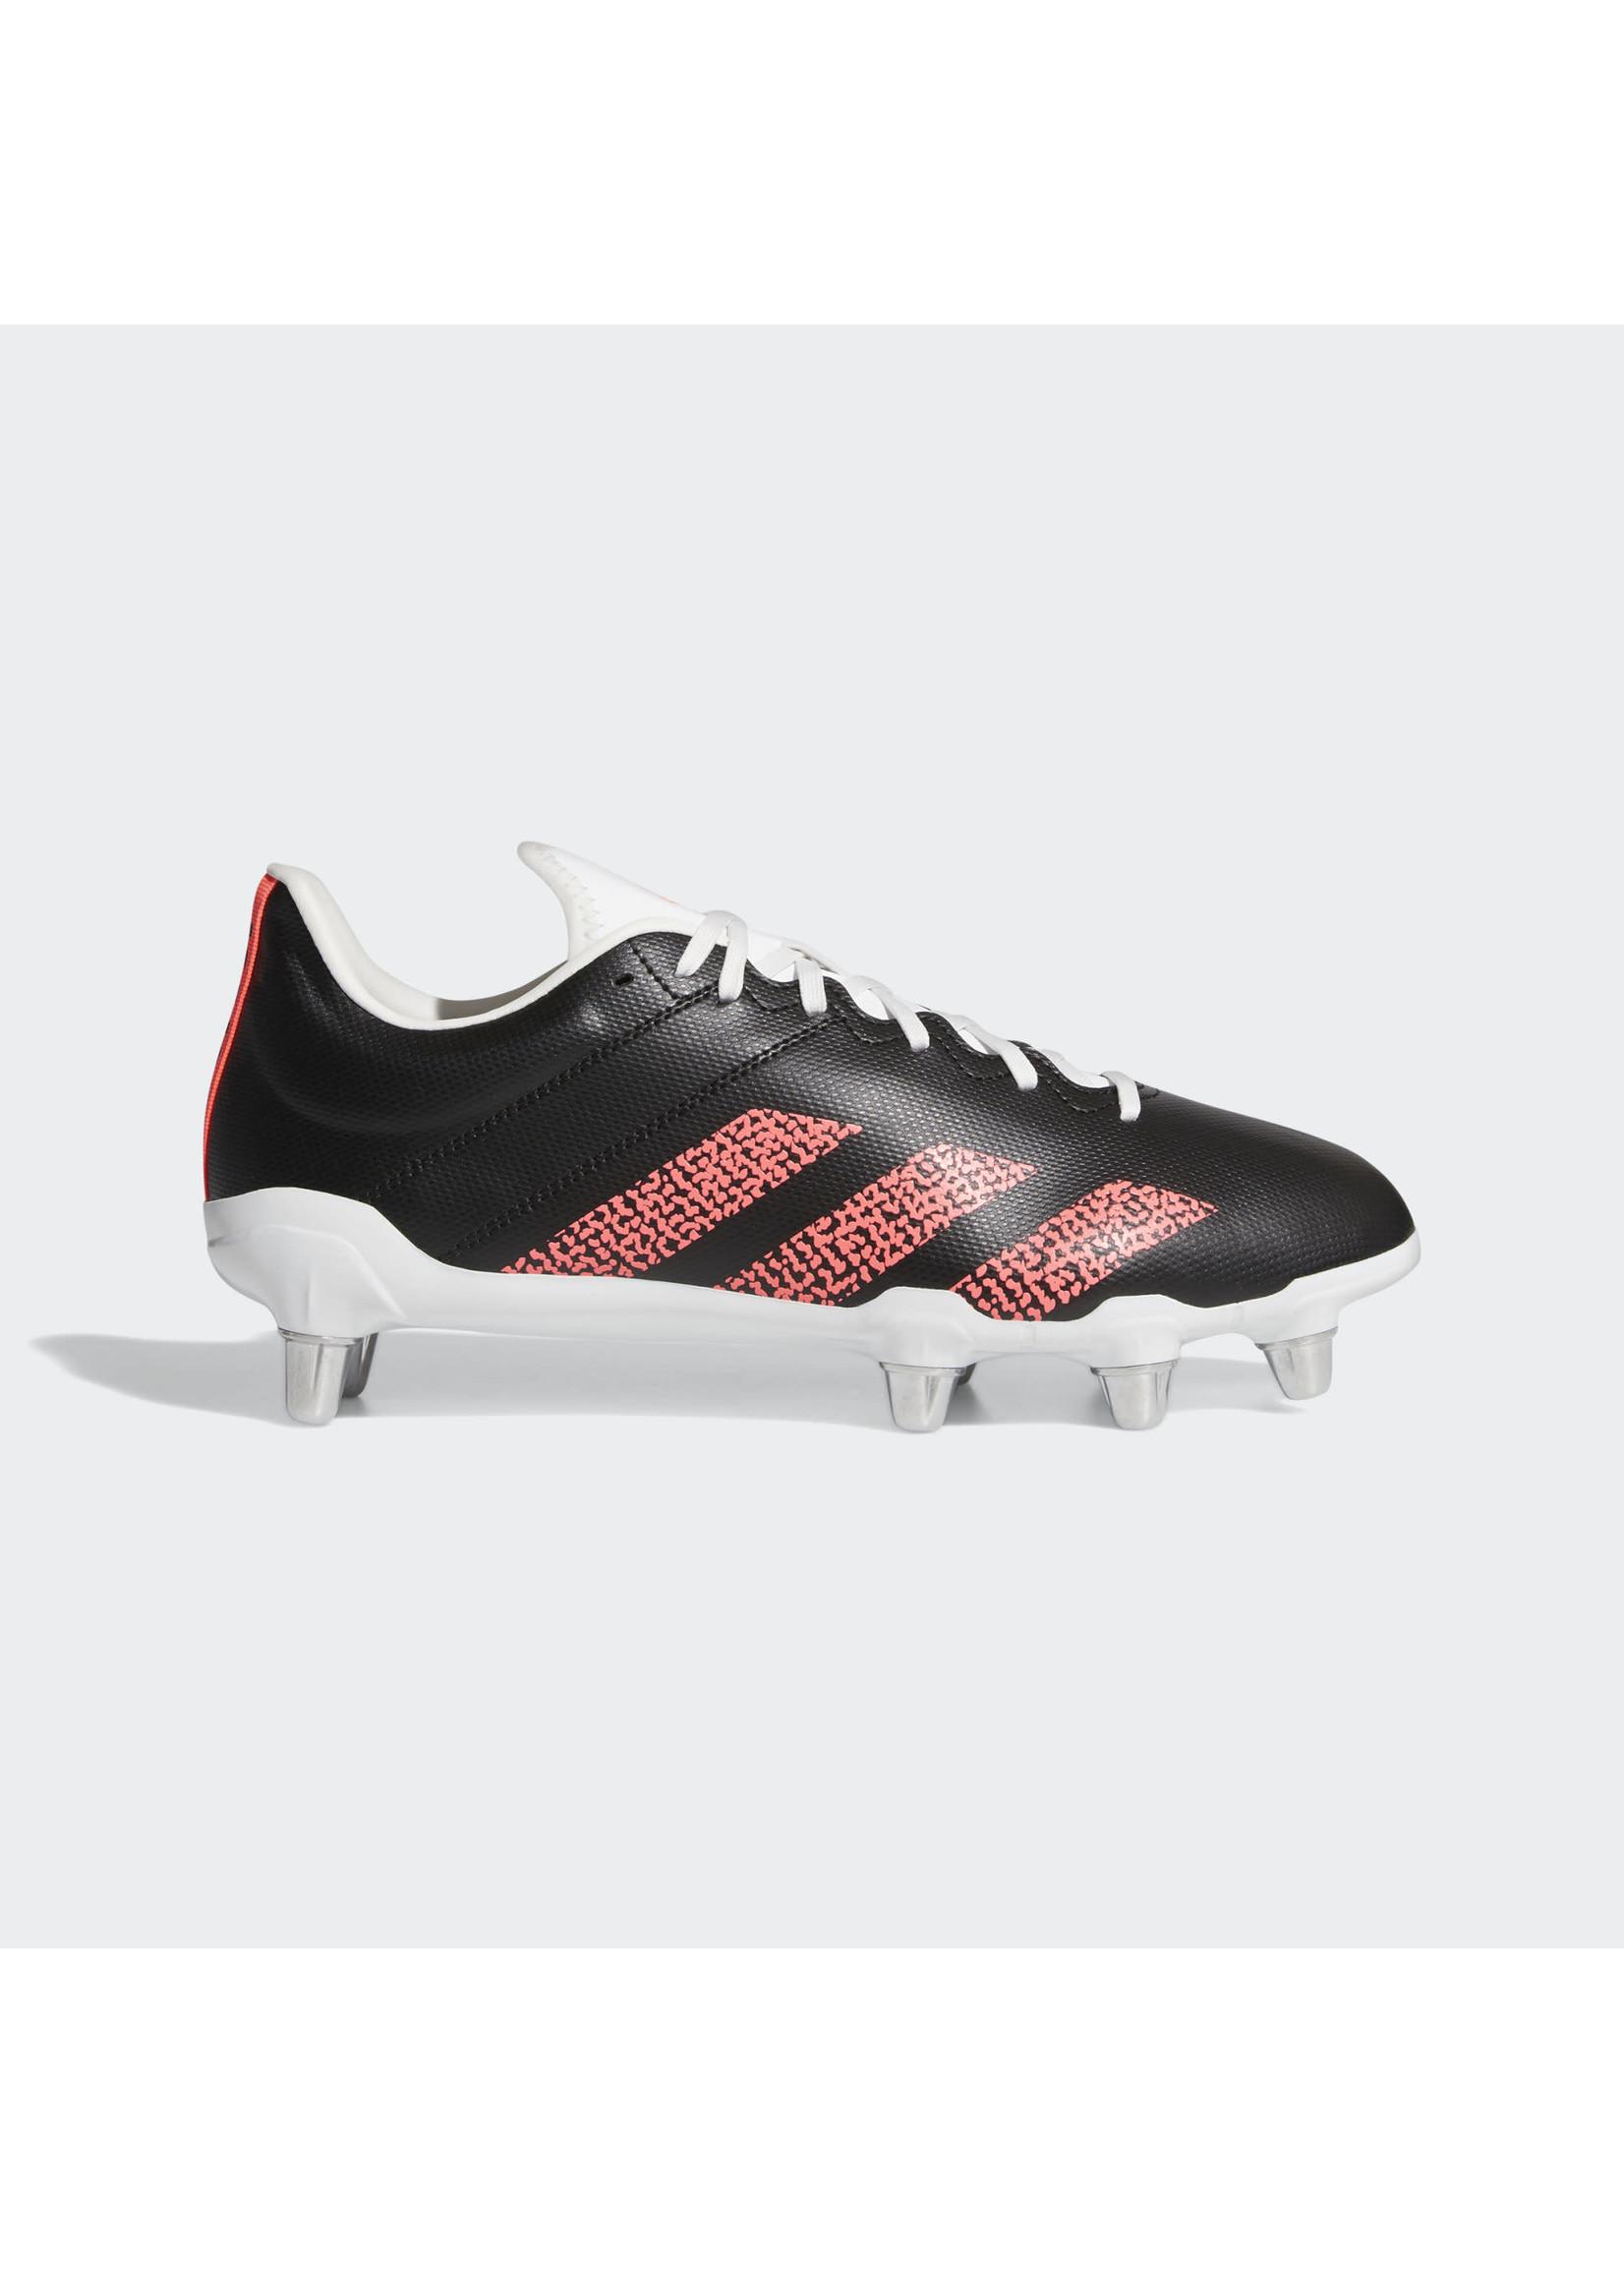 Adidas Adidas Kakari Rugby Boot (SG) - 2020